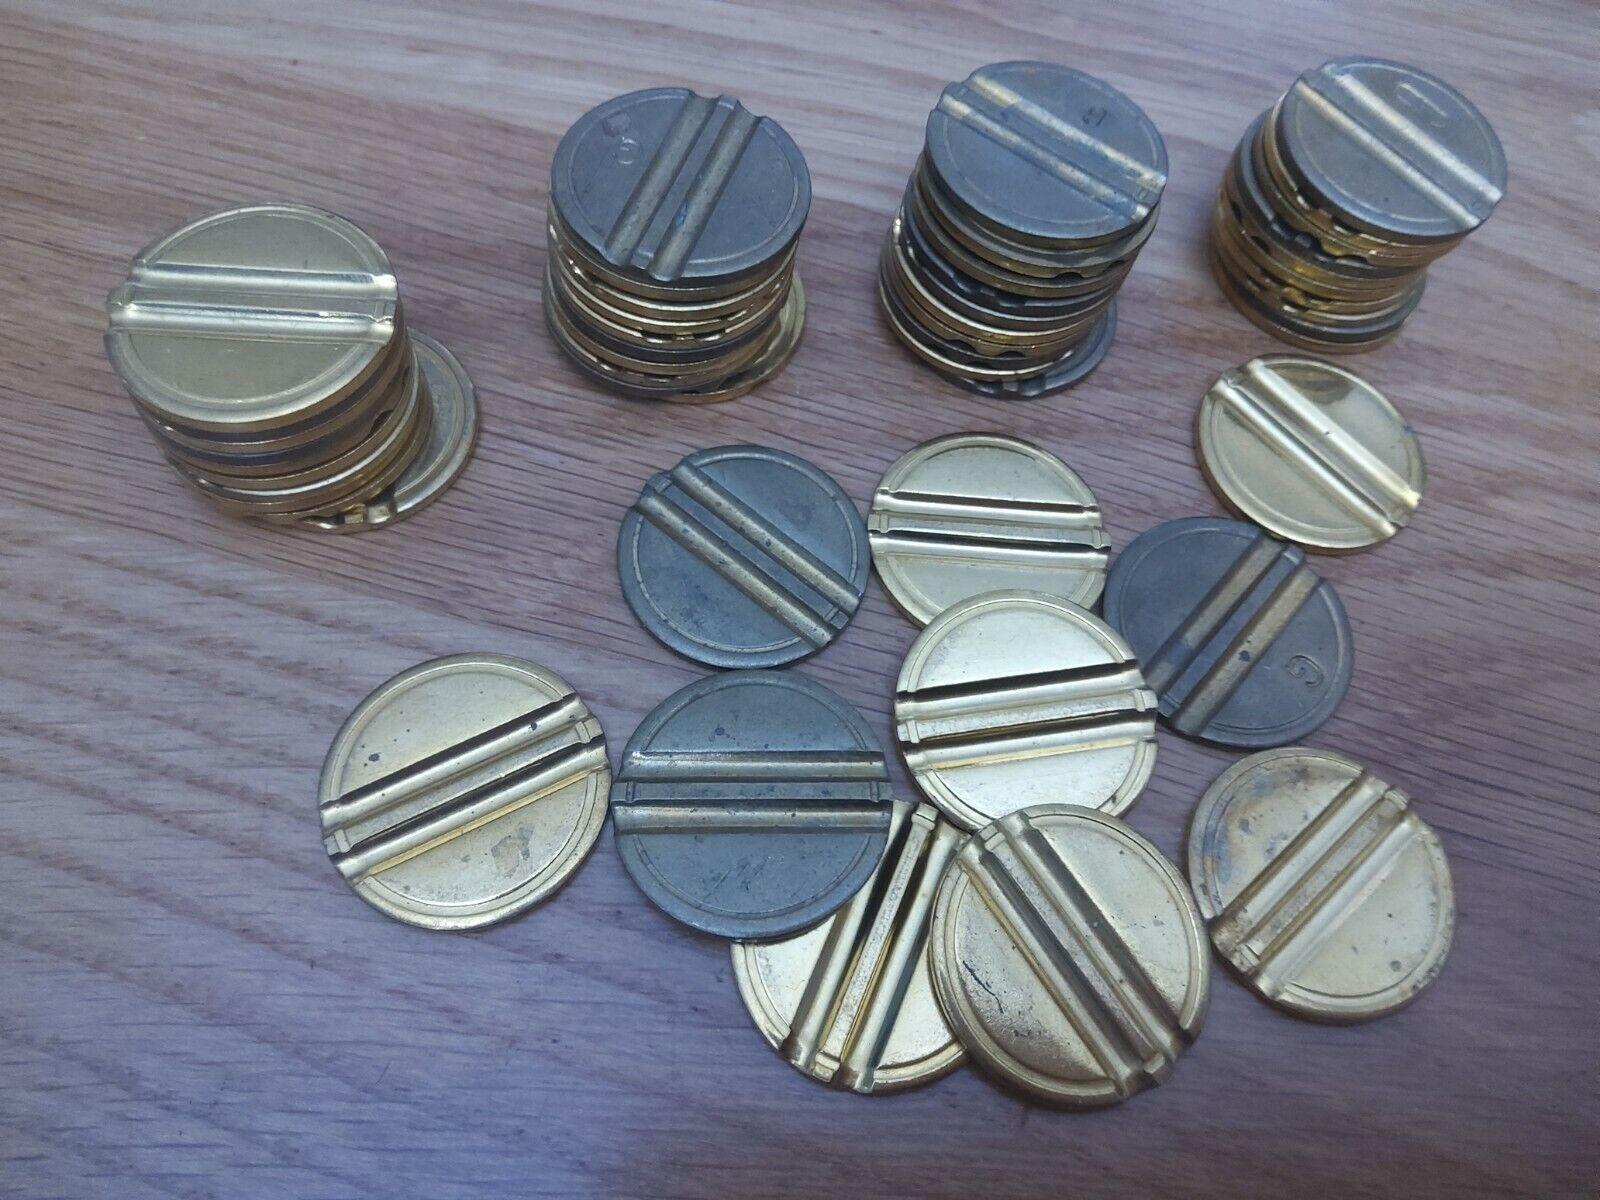 50 x Fruit machine 20p tokens, Steel double security slot